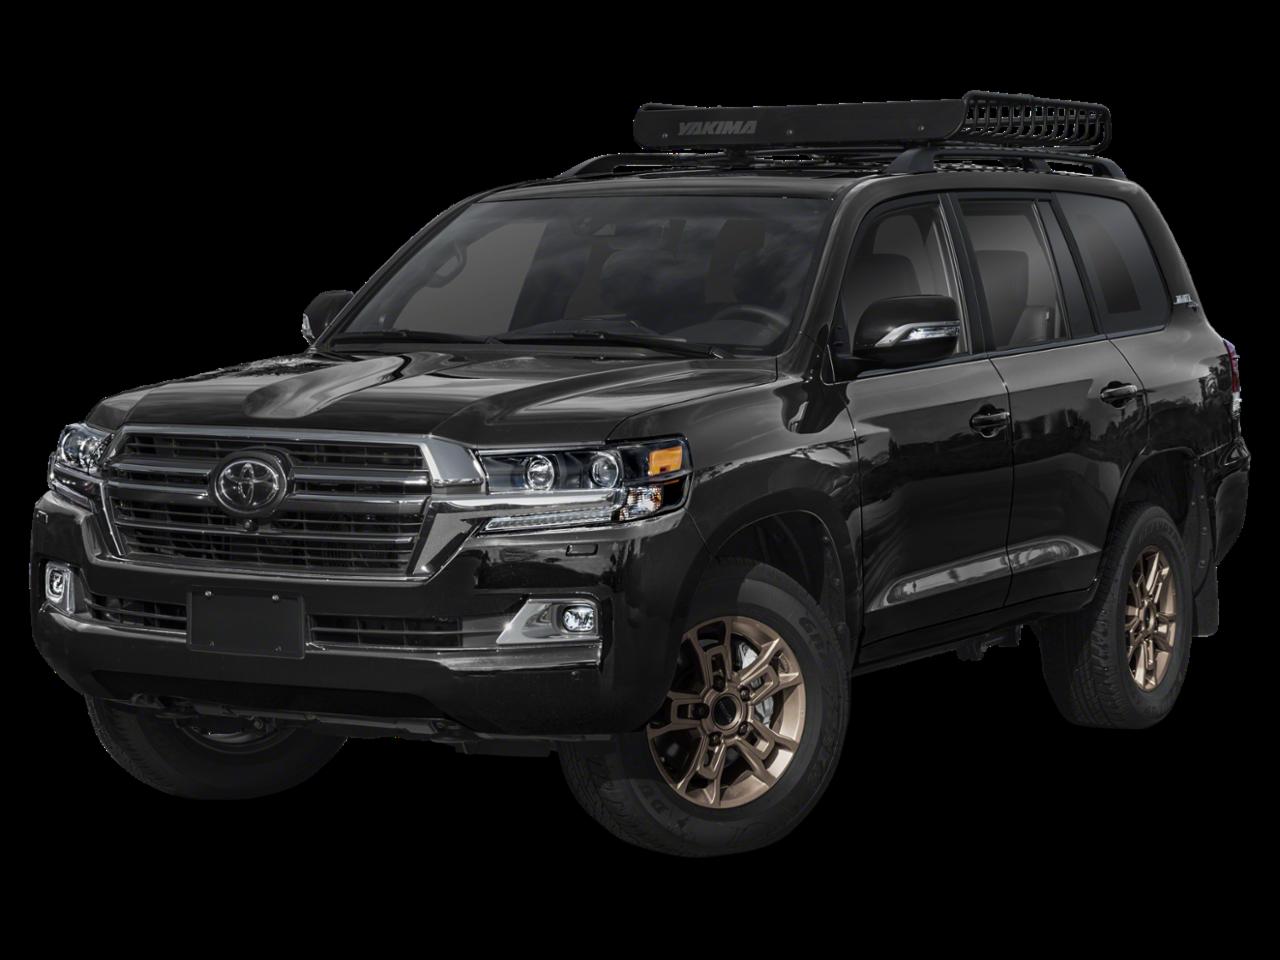 Toyota 2020 Land Cruiser Heritage Edition